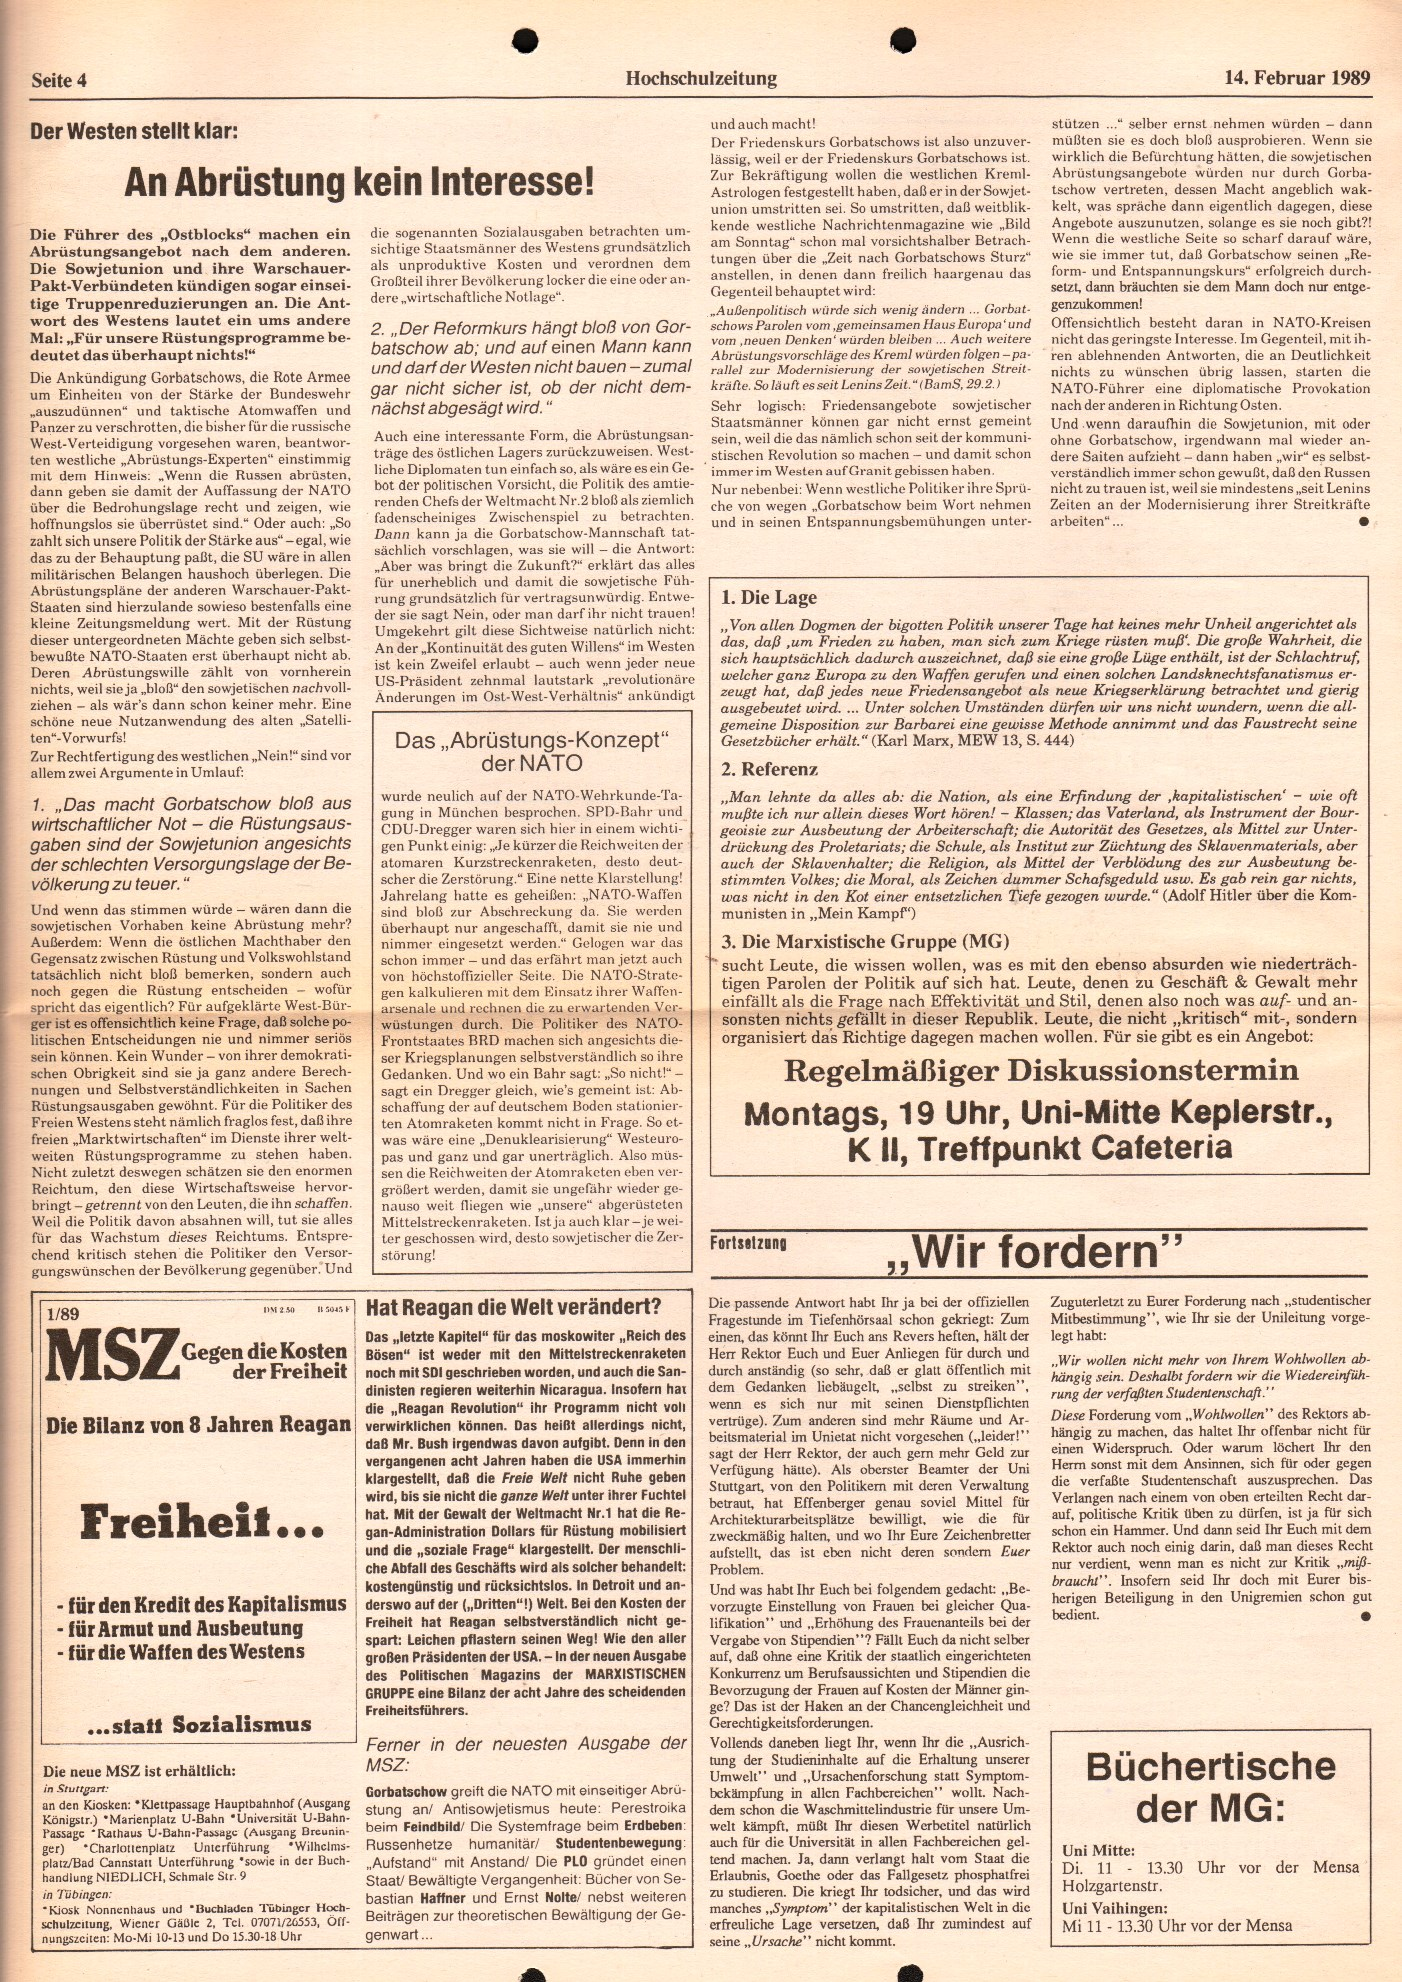 Stuttgart_MG_Hochschulzeitung_1989_03_04